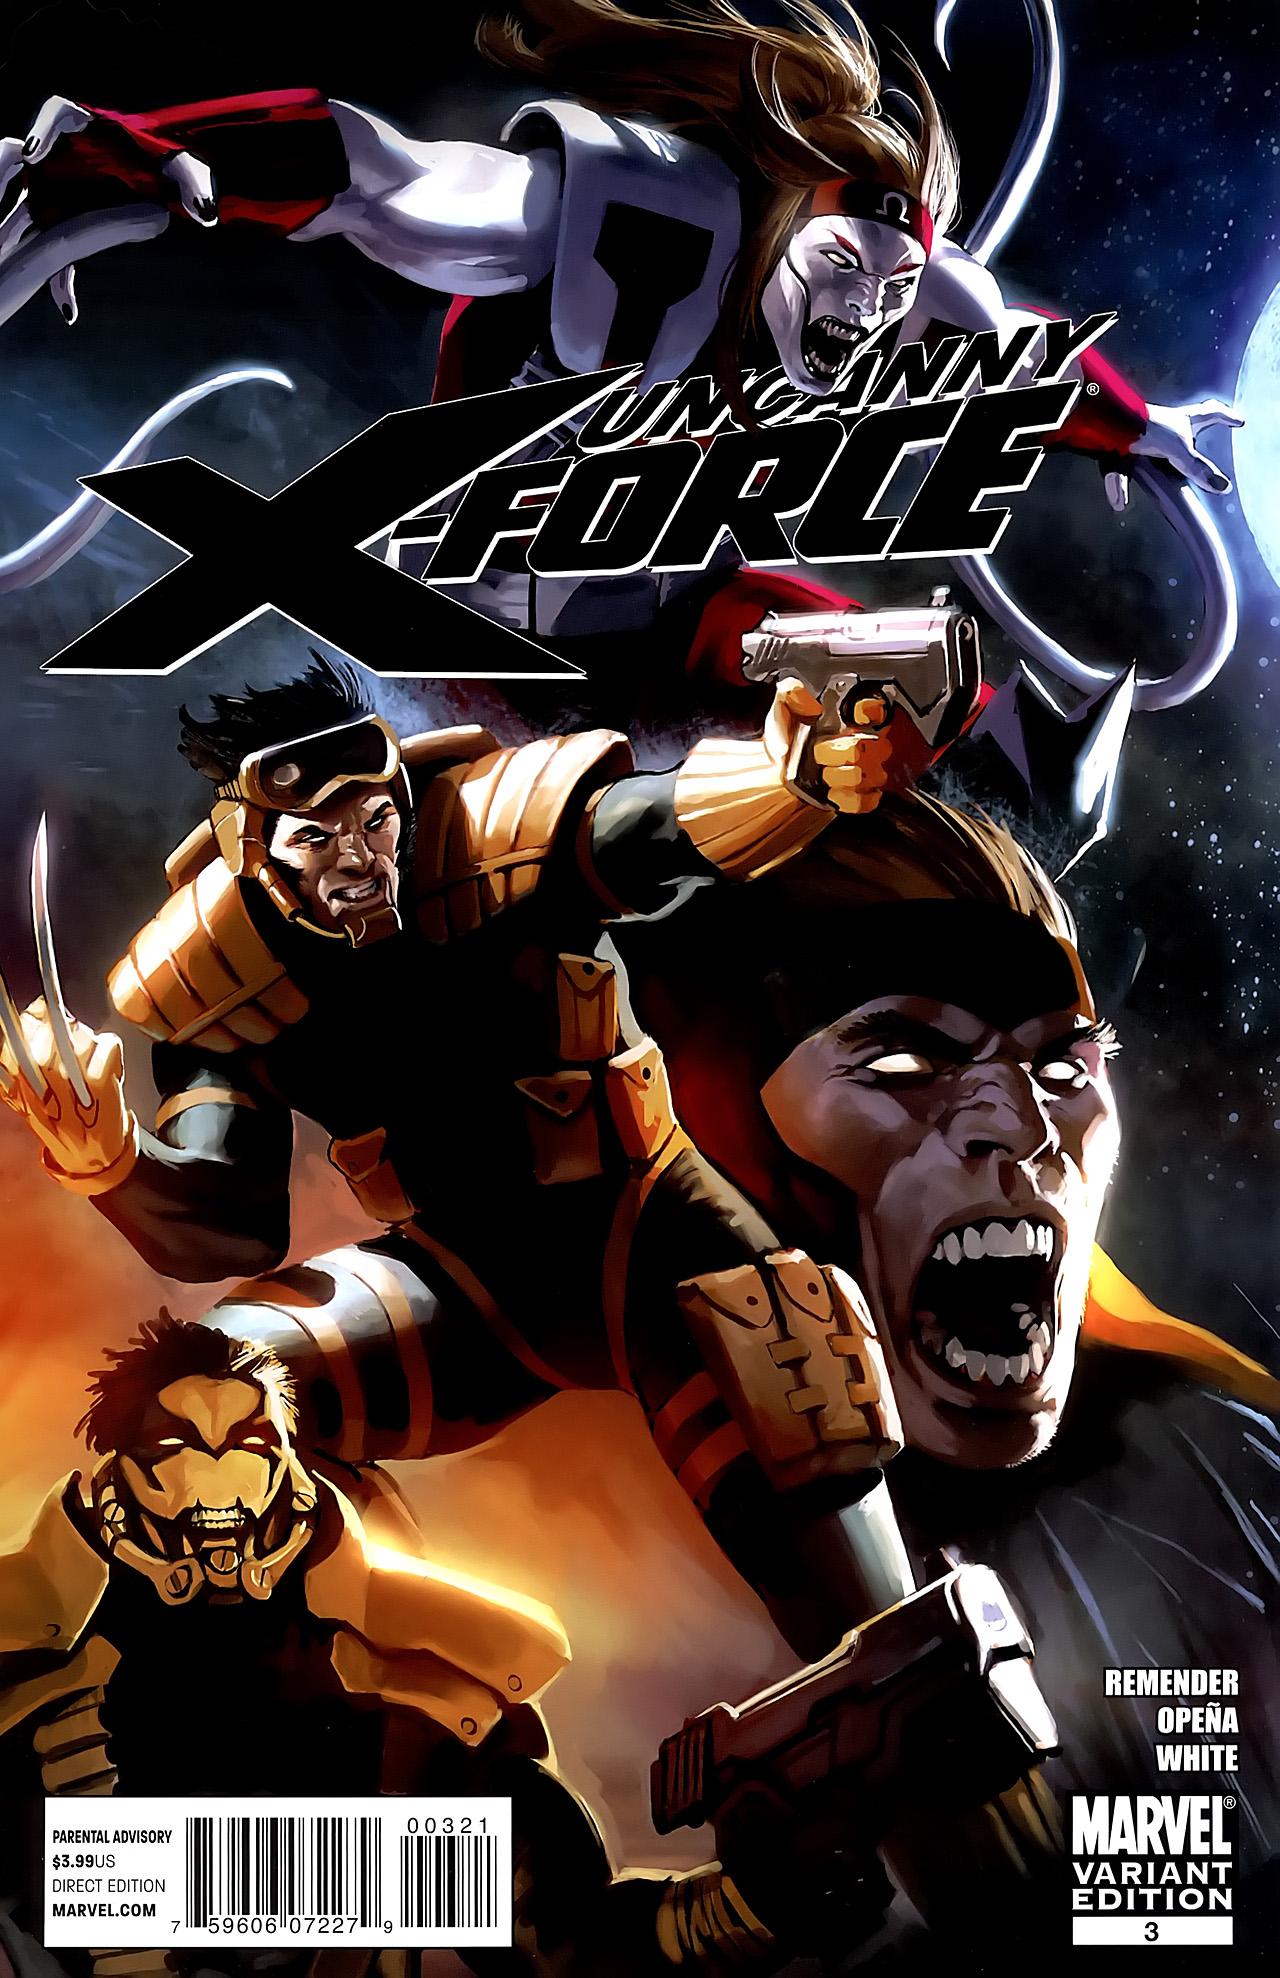 Uncanny X-Force Vol 1 3 (Marko Djurdjevic Variant).jpg